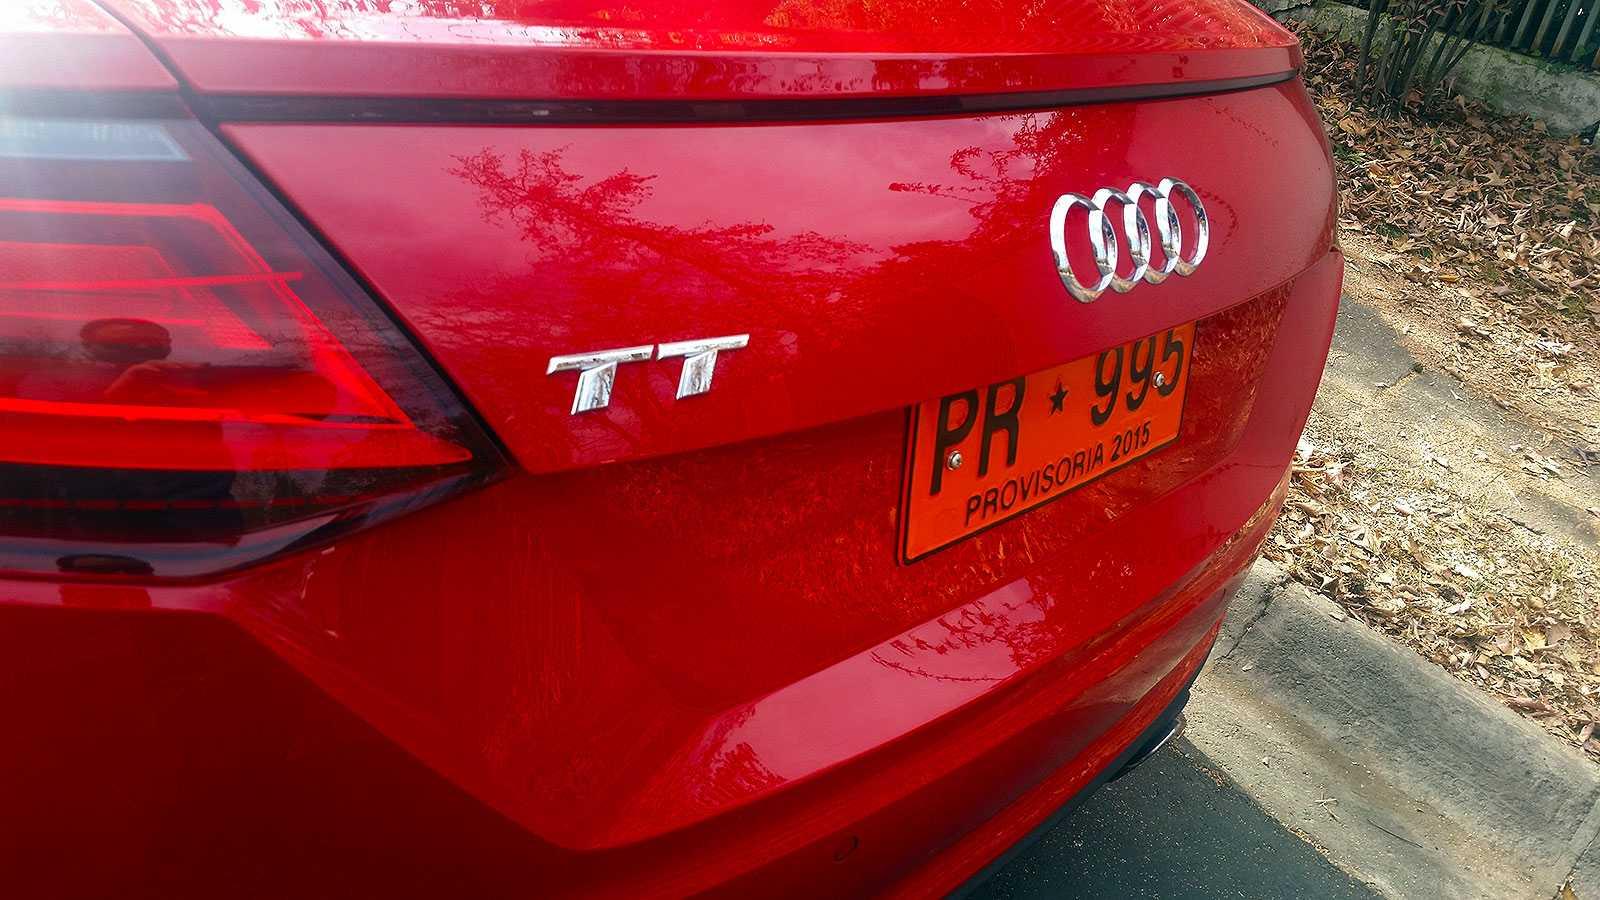 Audi TT 2.0 TFSi 230 CV Stronic Coupé 2015 Test Drive Rutamotor (10)